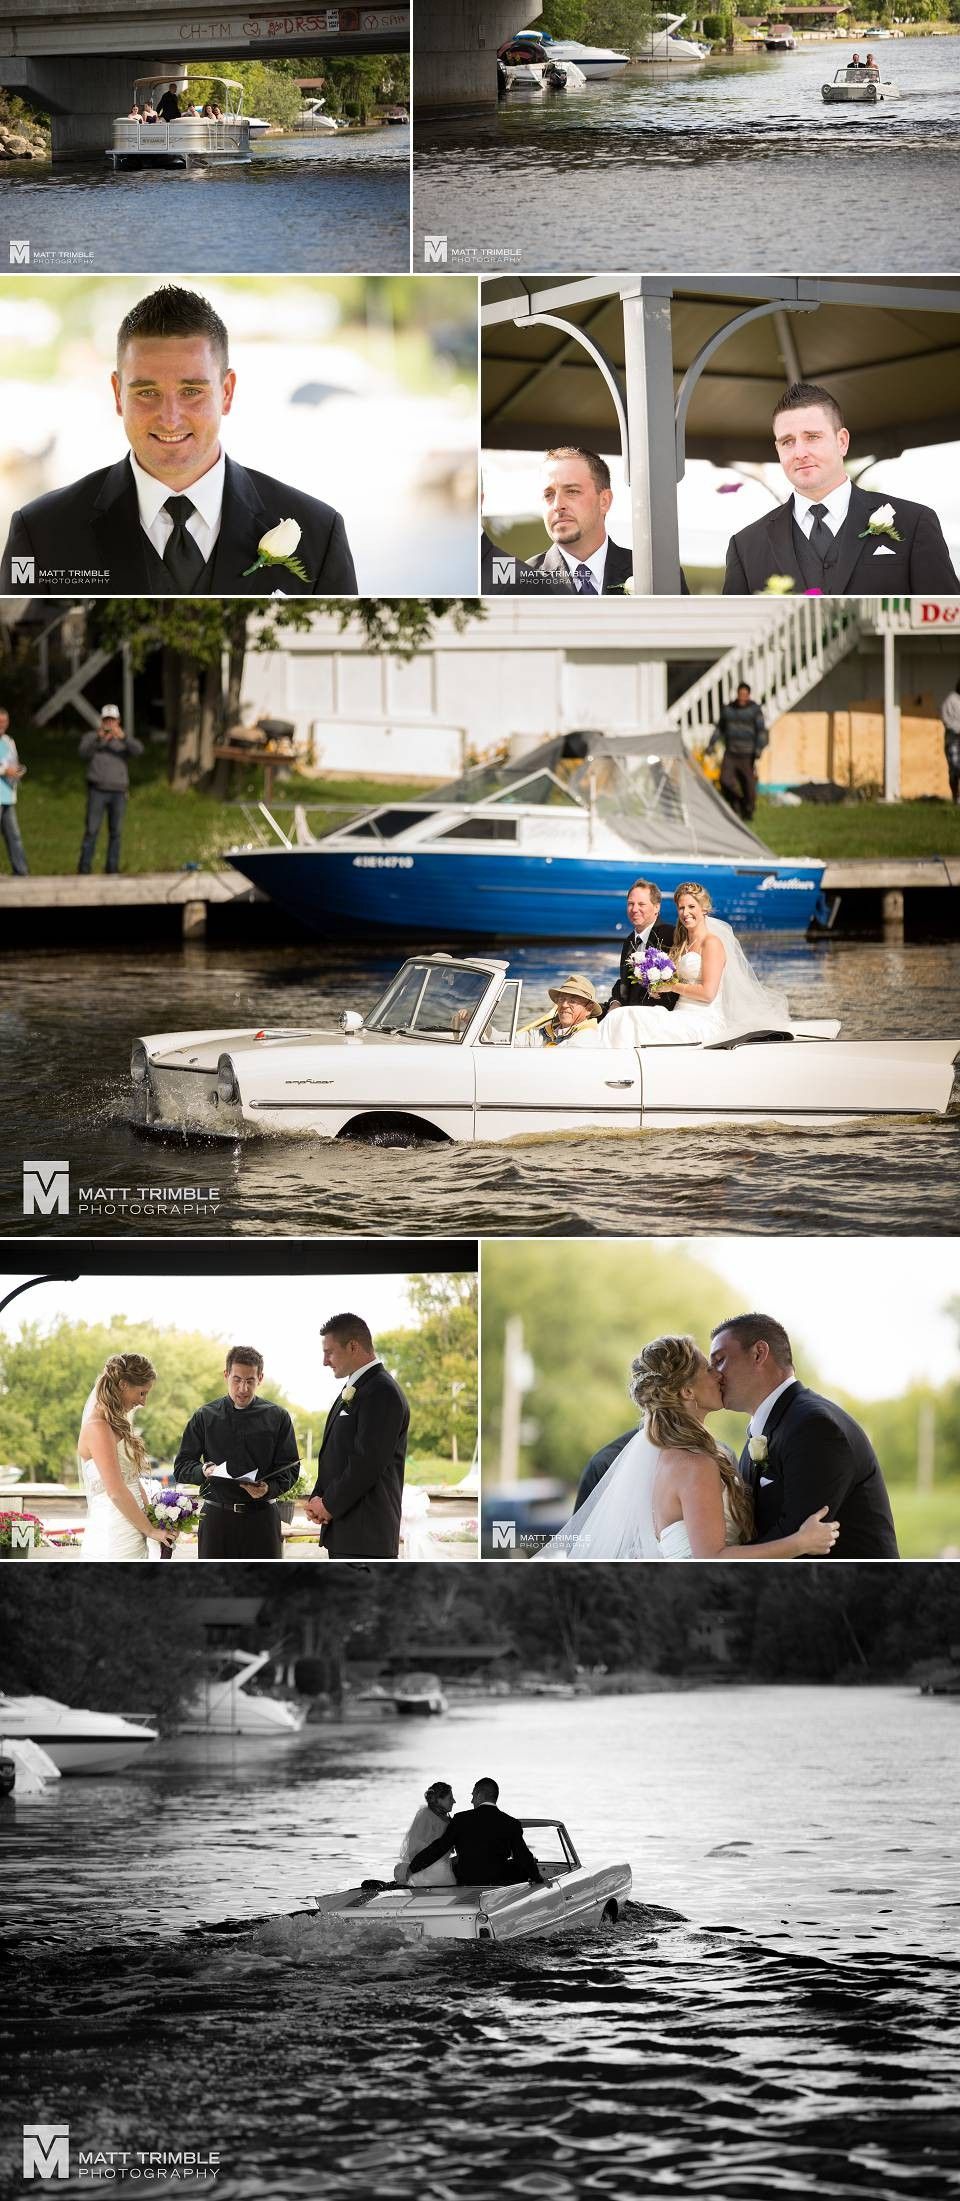 Pefferlaw wedding ceremony